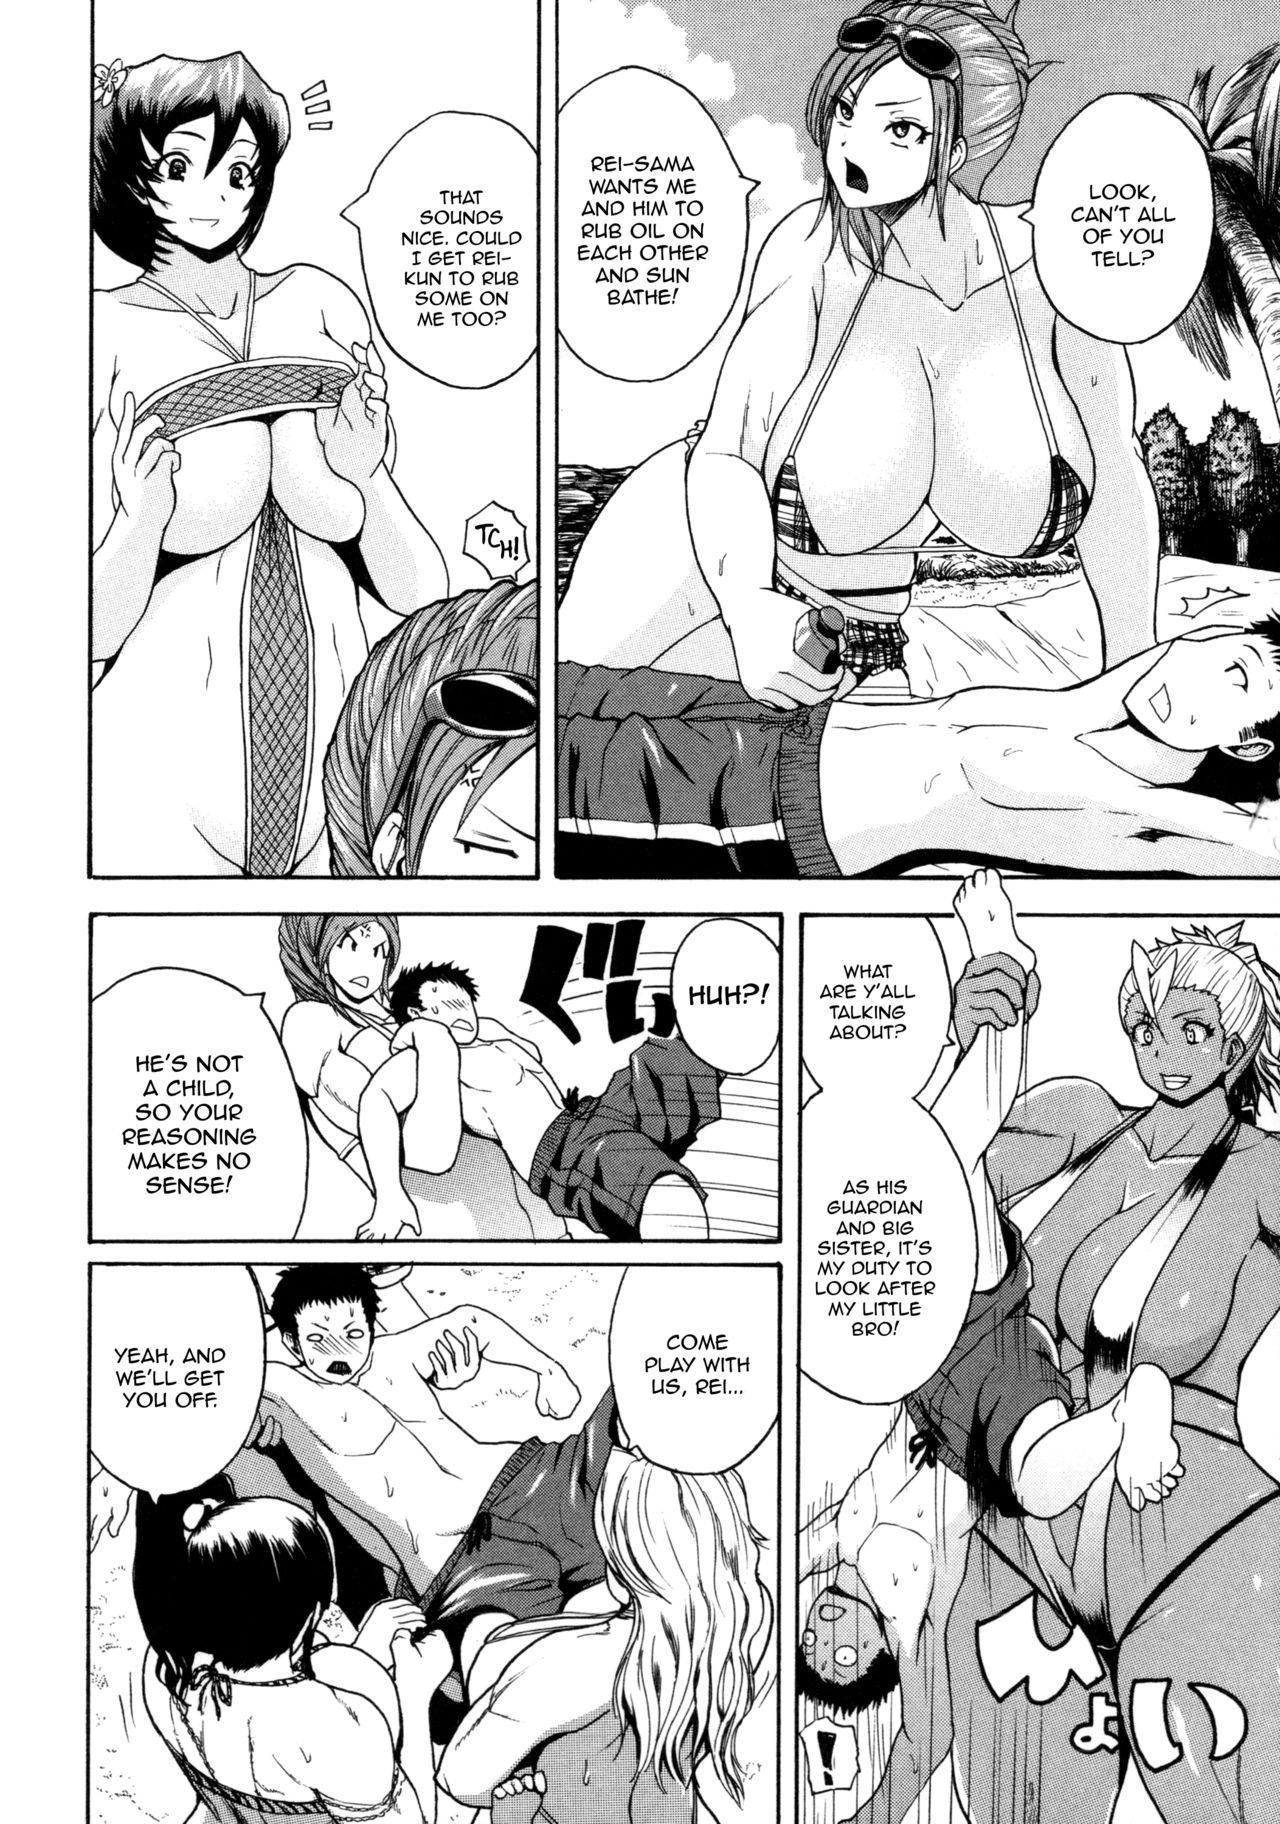 [Yoshimura Tatsumaki] Monzetsu Taigatame ~Count 3 de Ikasete Ageru~ | Faint in Agony Bodylock ~I'll make you cum on the count of 3~ [English] [Brolen] 192